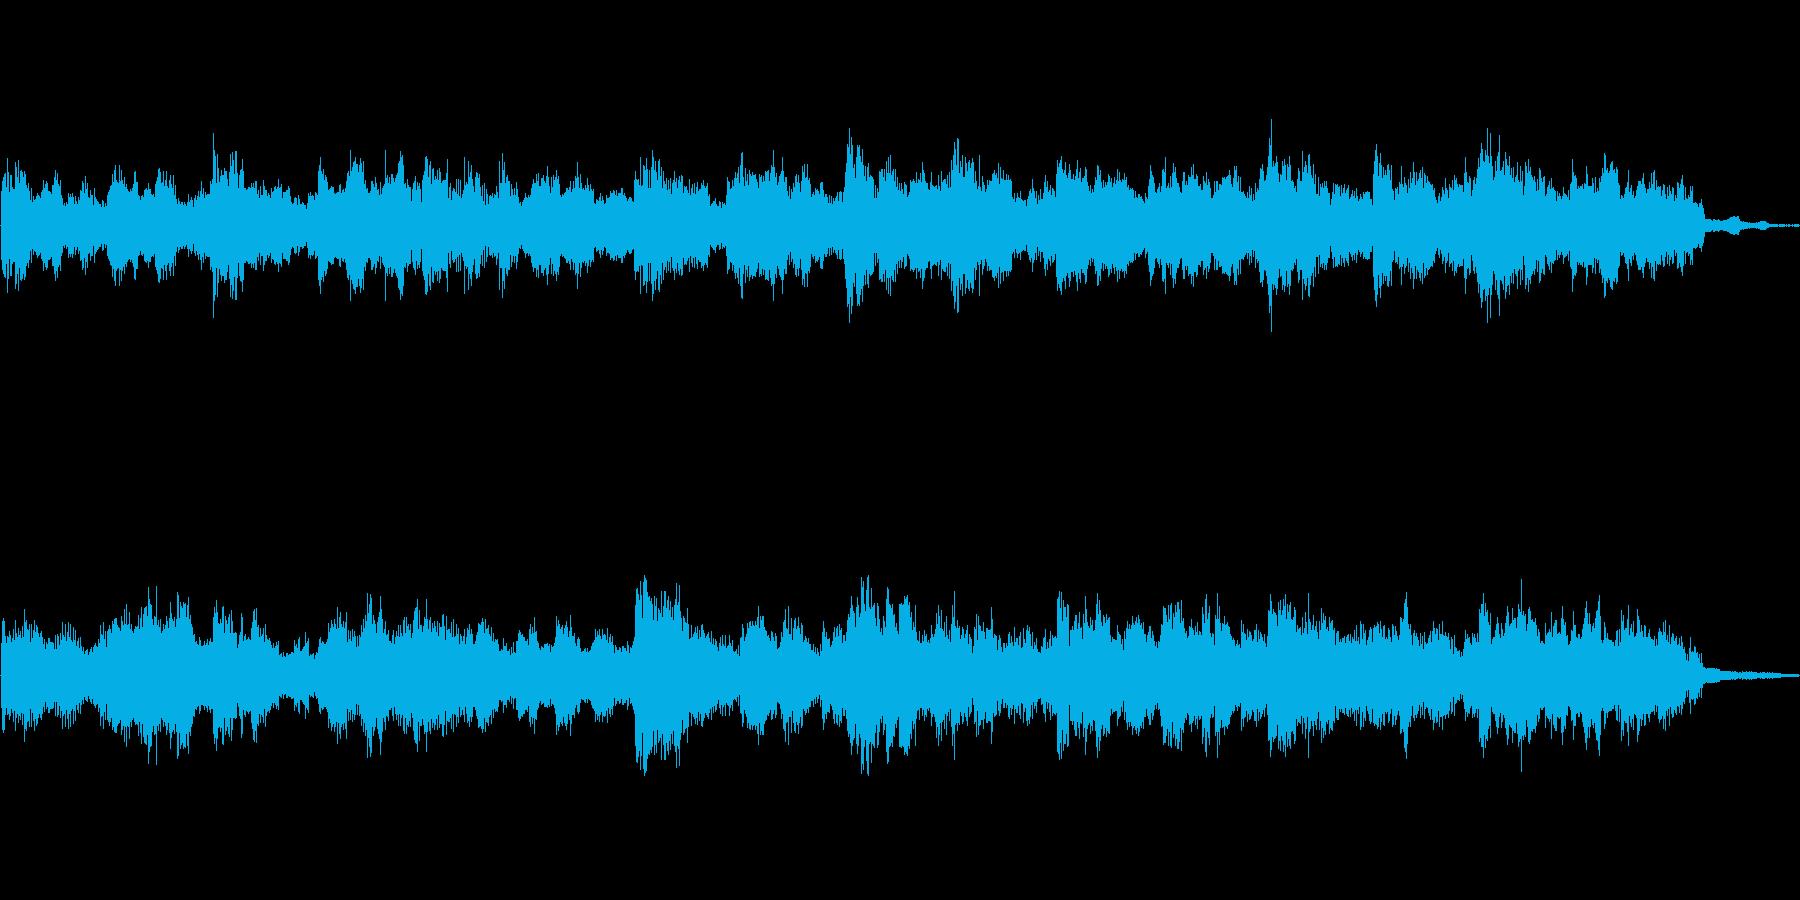 Soundtrack 2の再生済みの波形